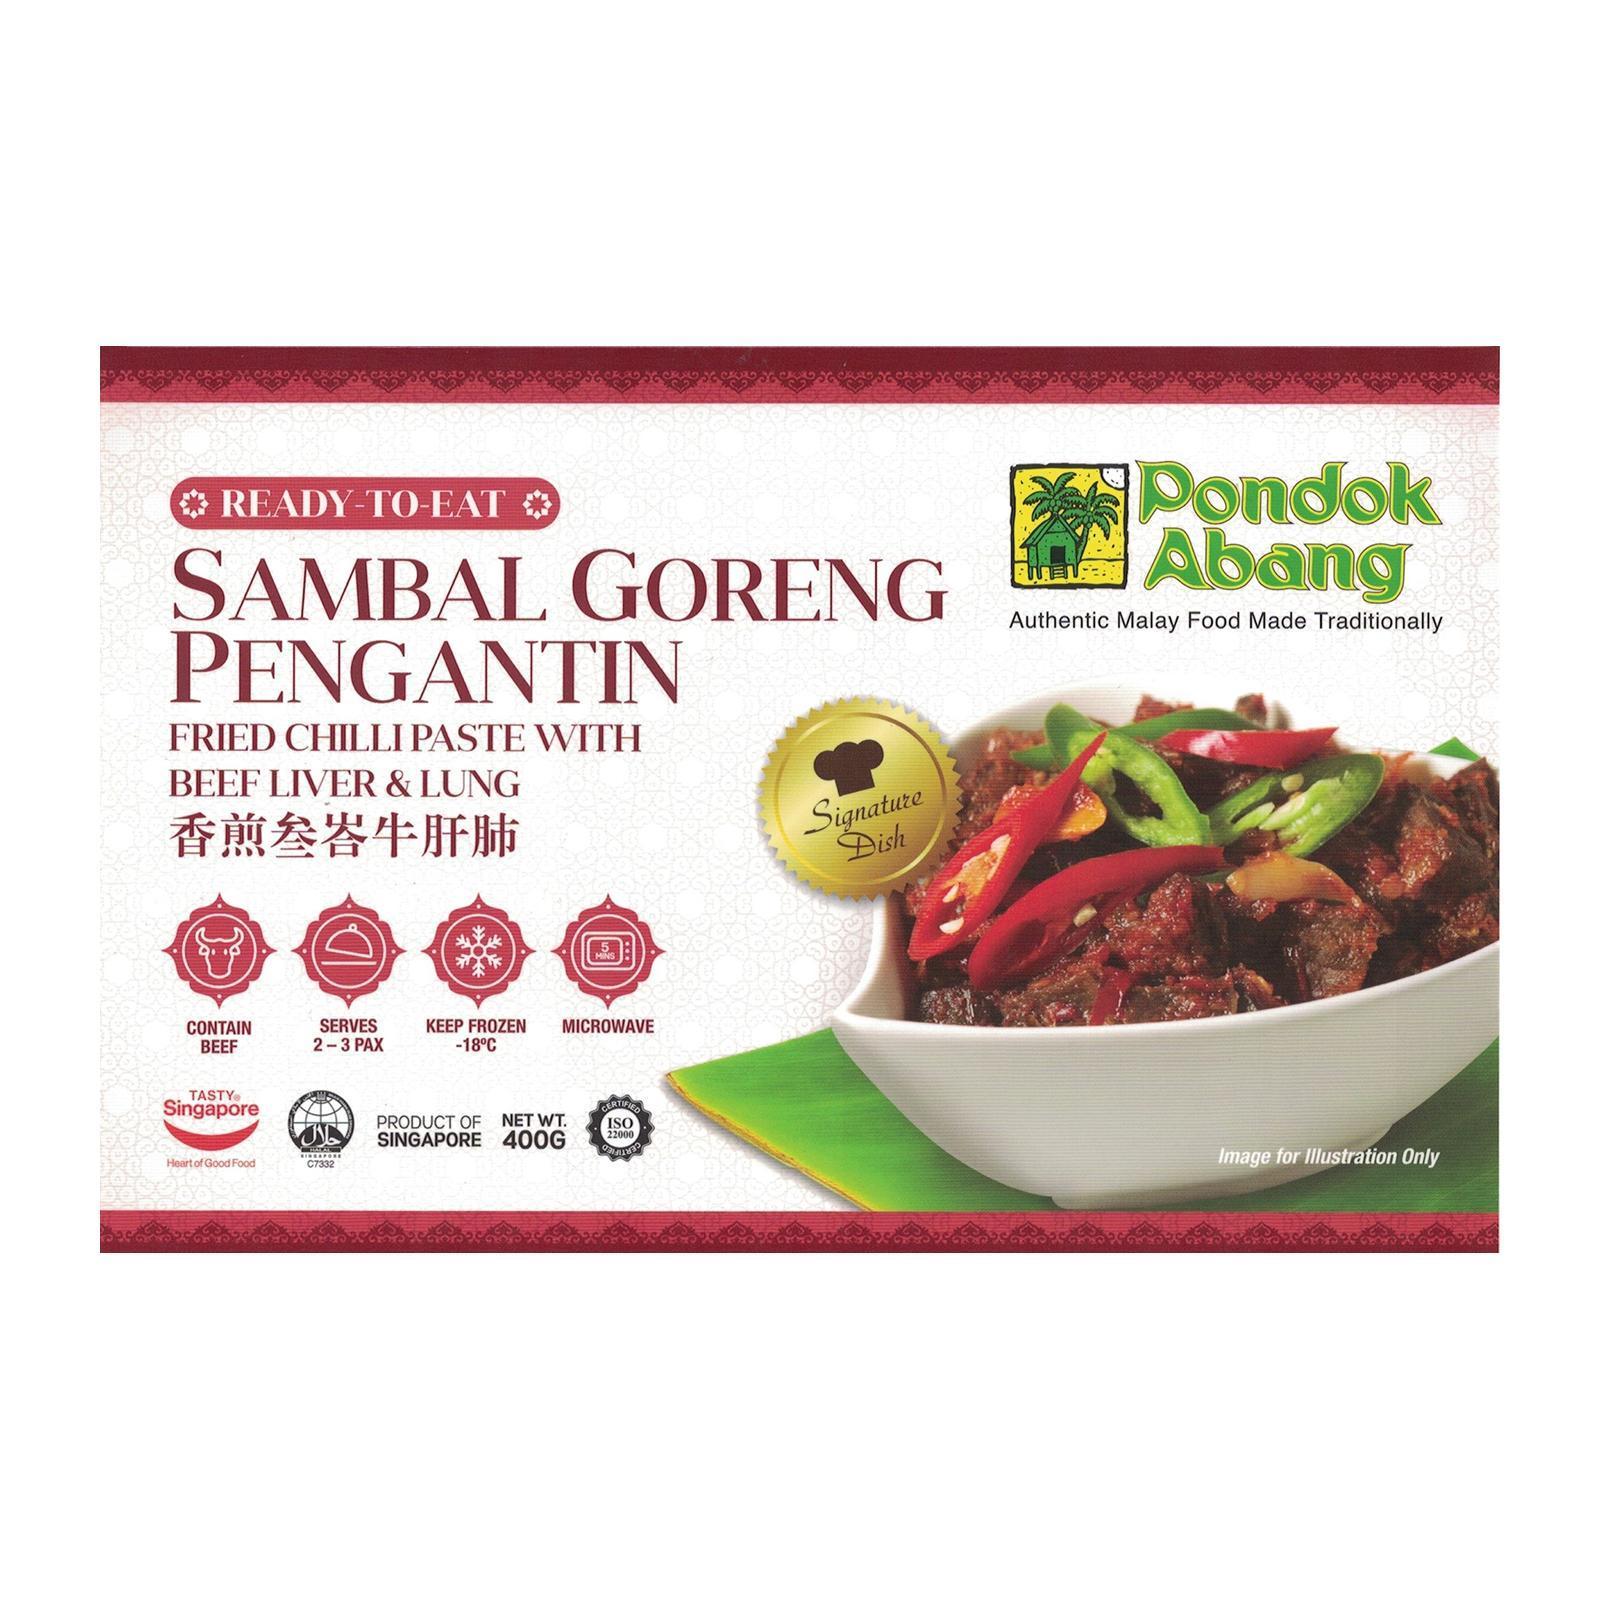 Pondok Abang Fried Chilli Paste with Beef Lungs and Liver (Sambal Goreng Pengantin) - Frozen